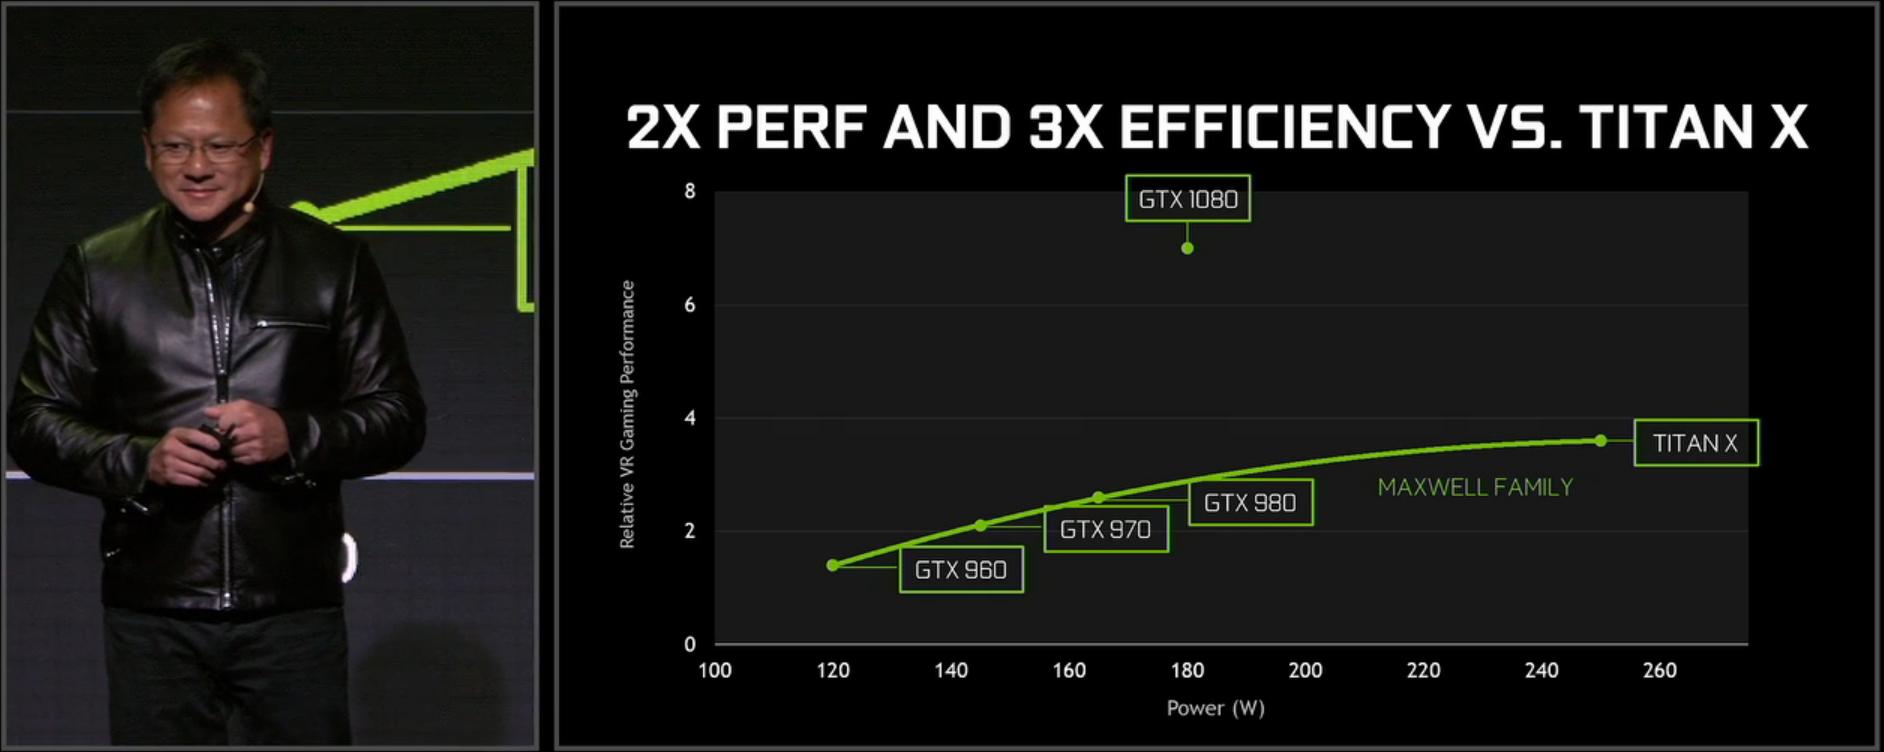 GTX-1080-scale.jpg